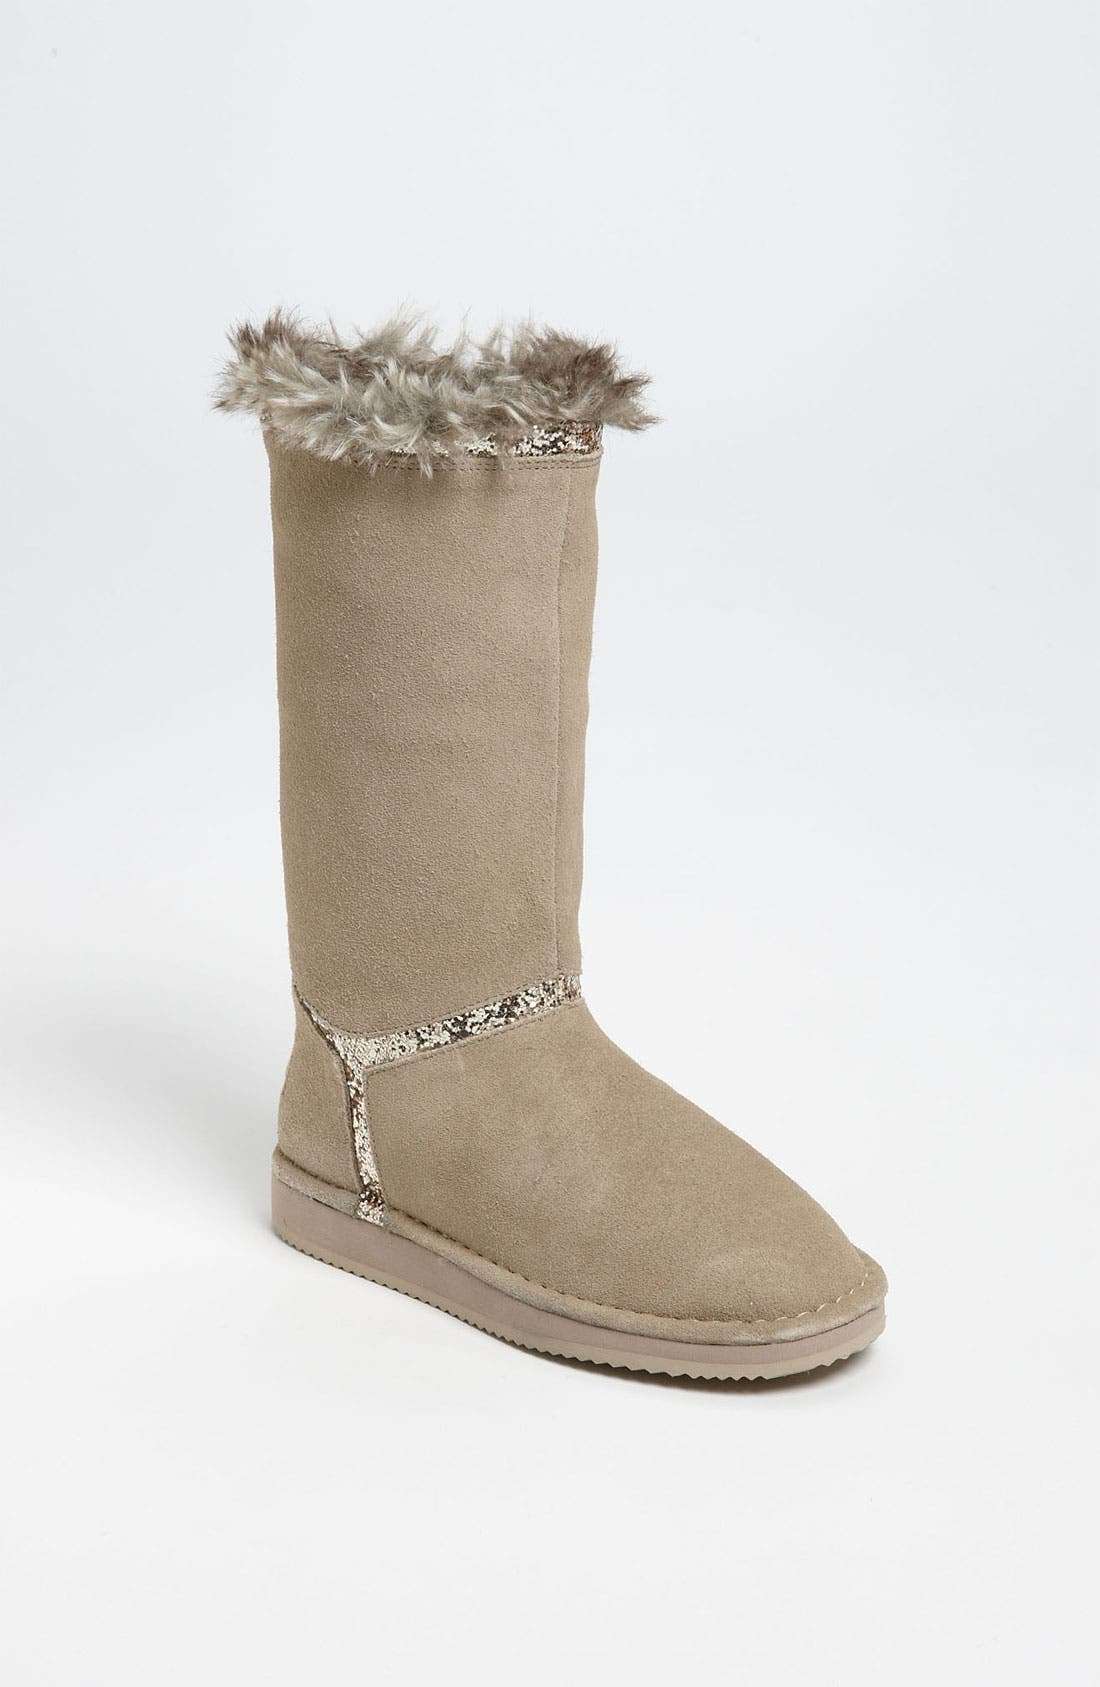 Alternate Image 1 Selected - Juicy Couture 'Miara' Boot (Toddler, Little Kid & Big Kid)